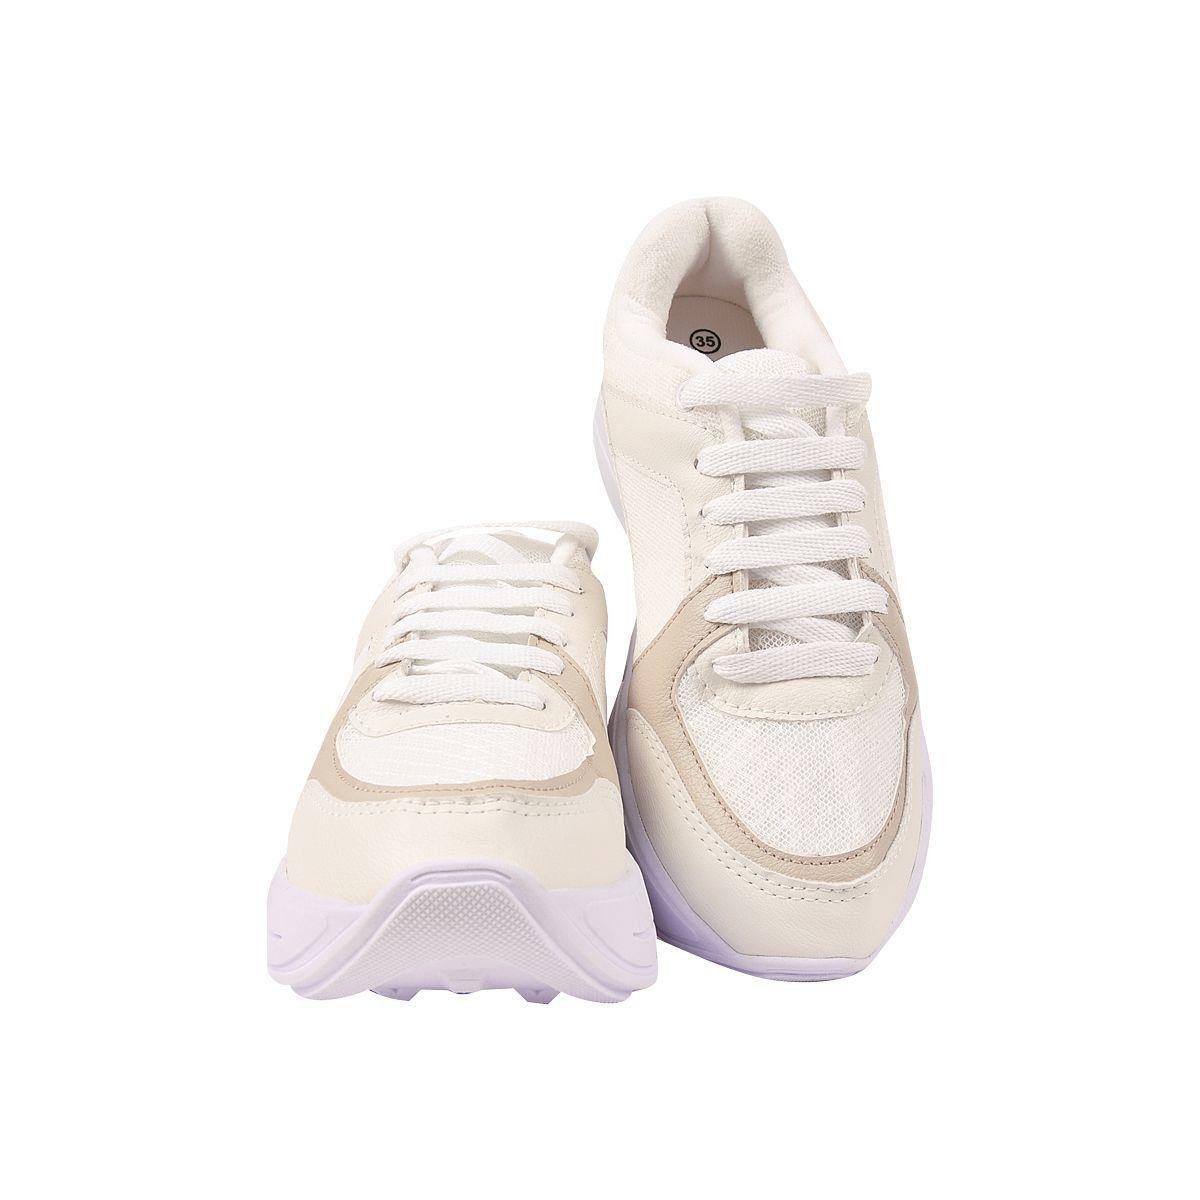 Tênis Chiquiteira Casual Natural Branco/Branco FLR